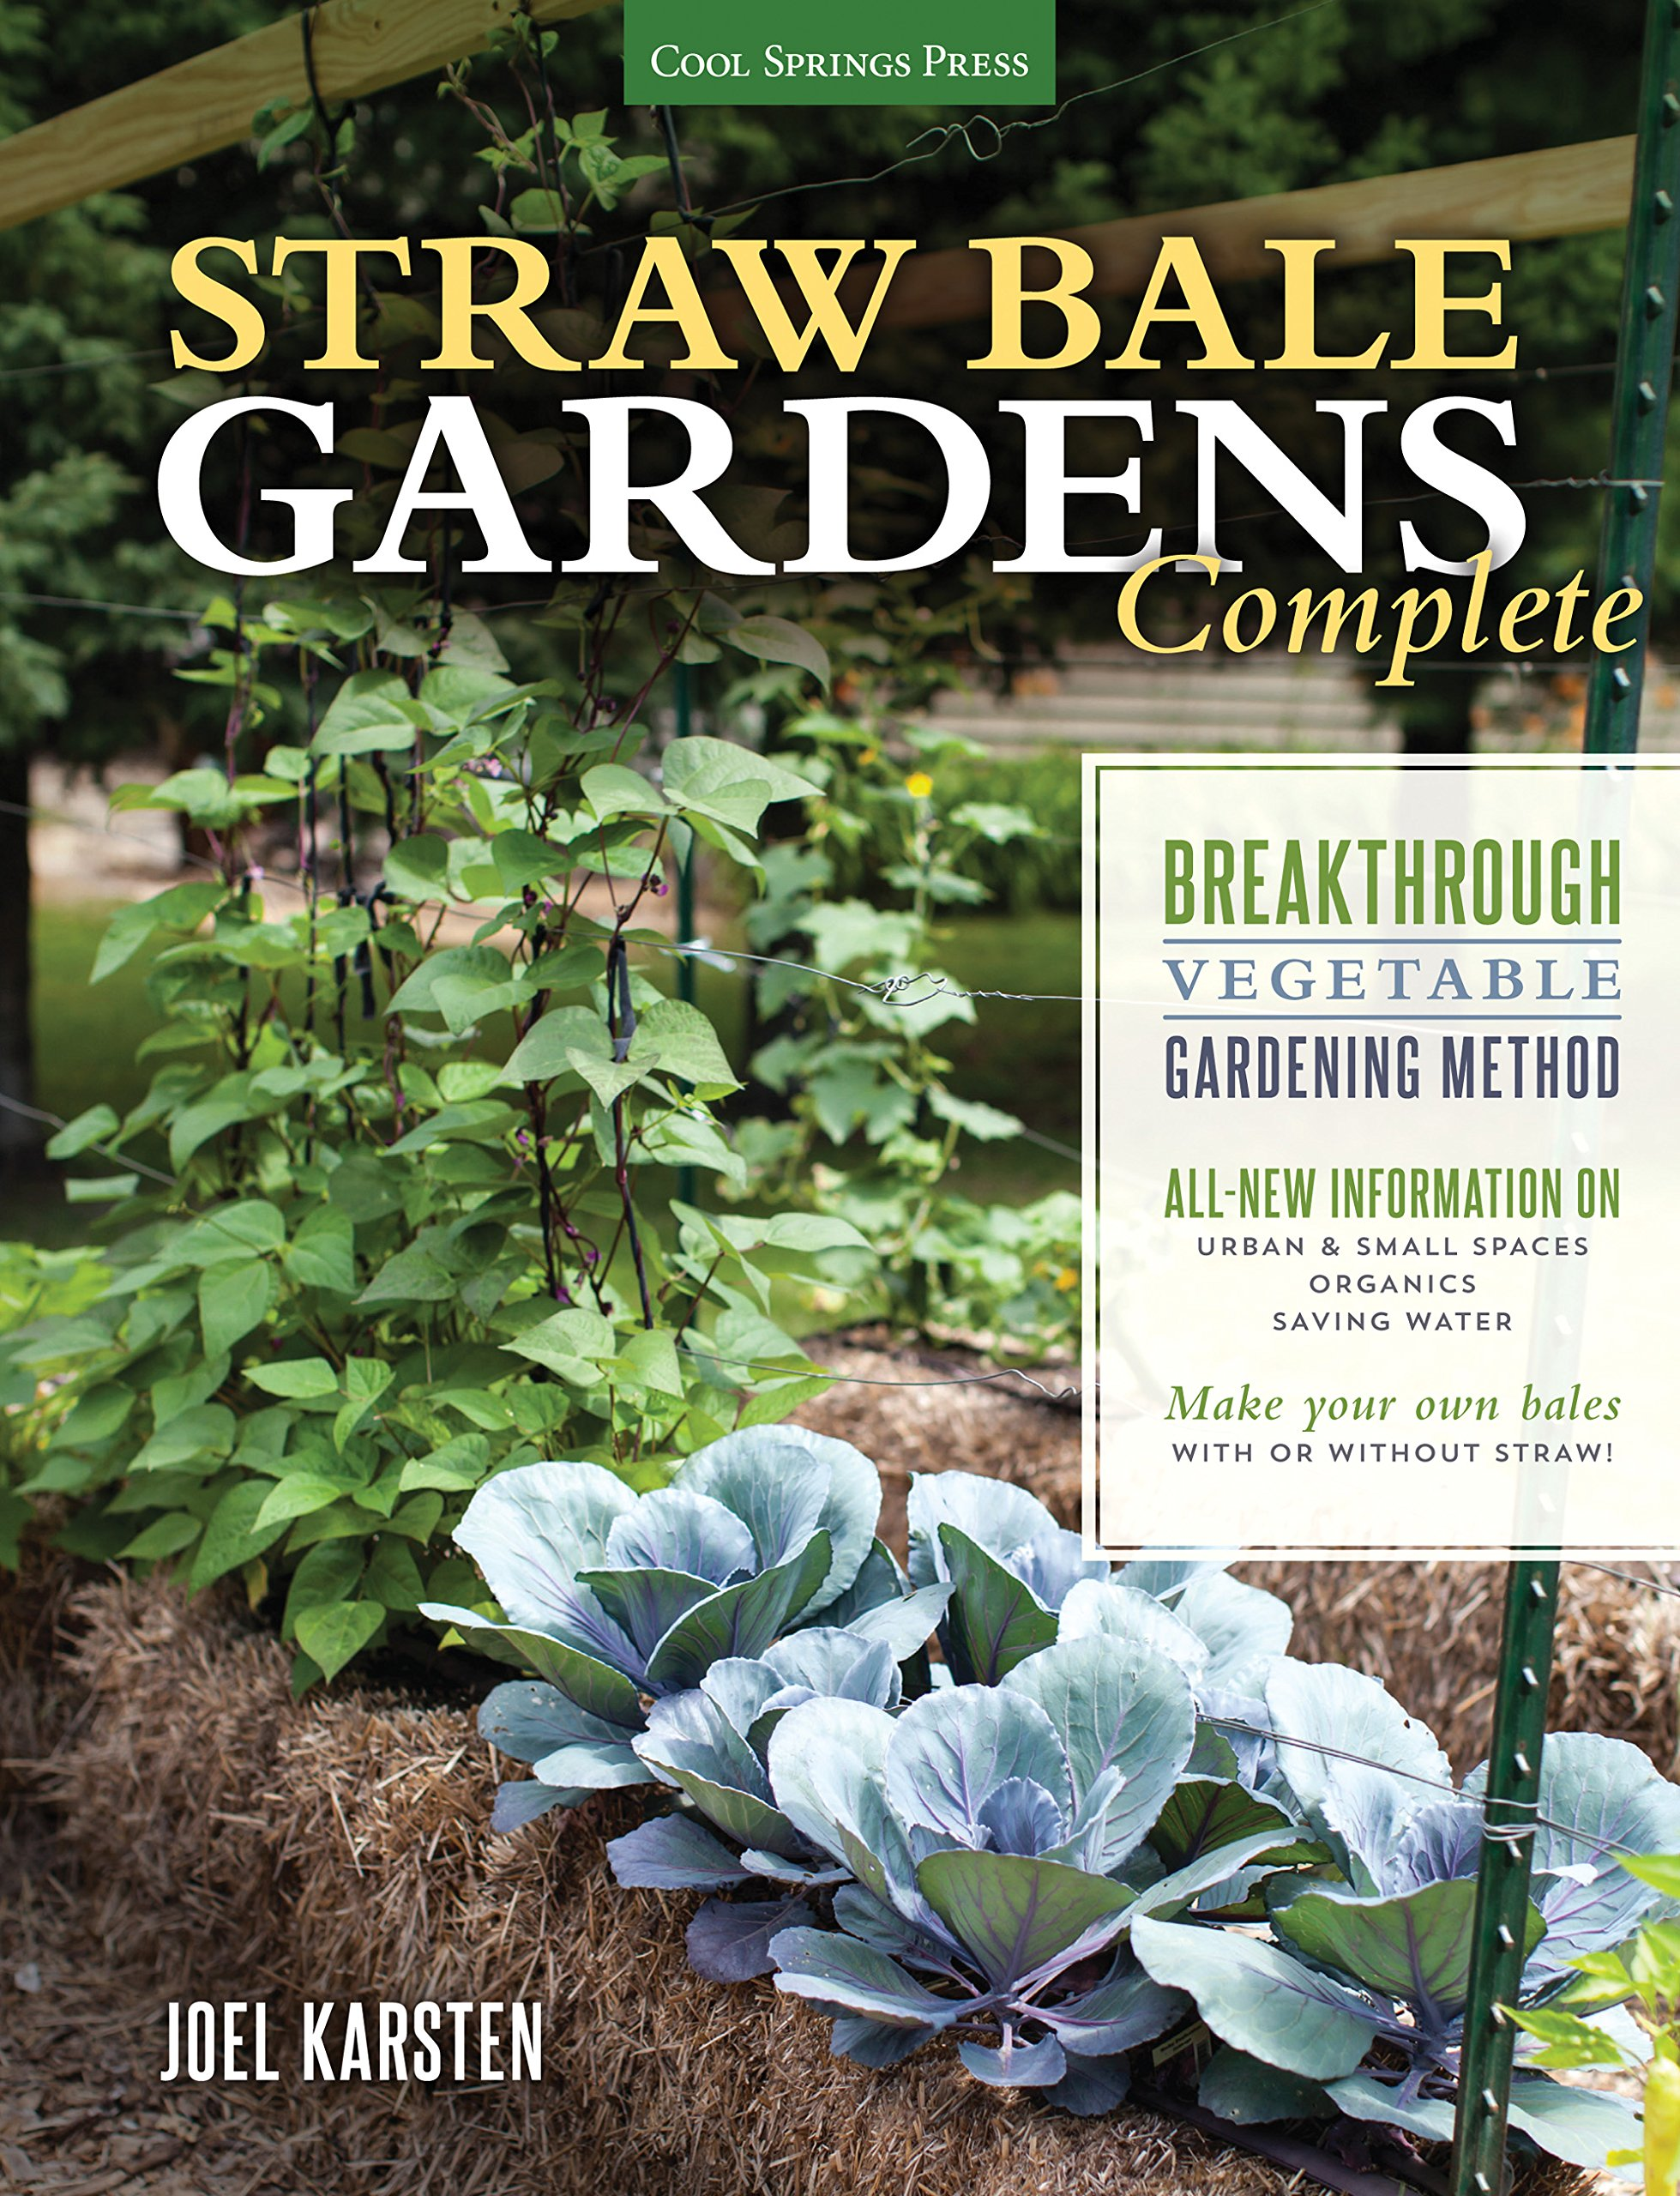 Straw Bale Gardens Complete: Joel Karsten: 0884590159207: Amazon.com: Books